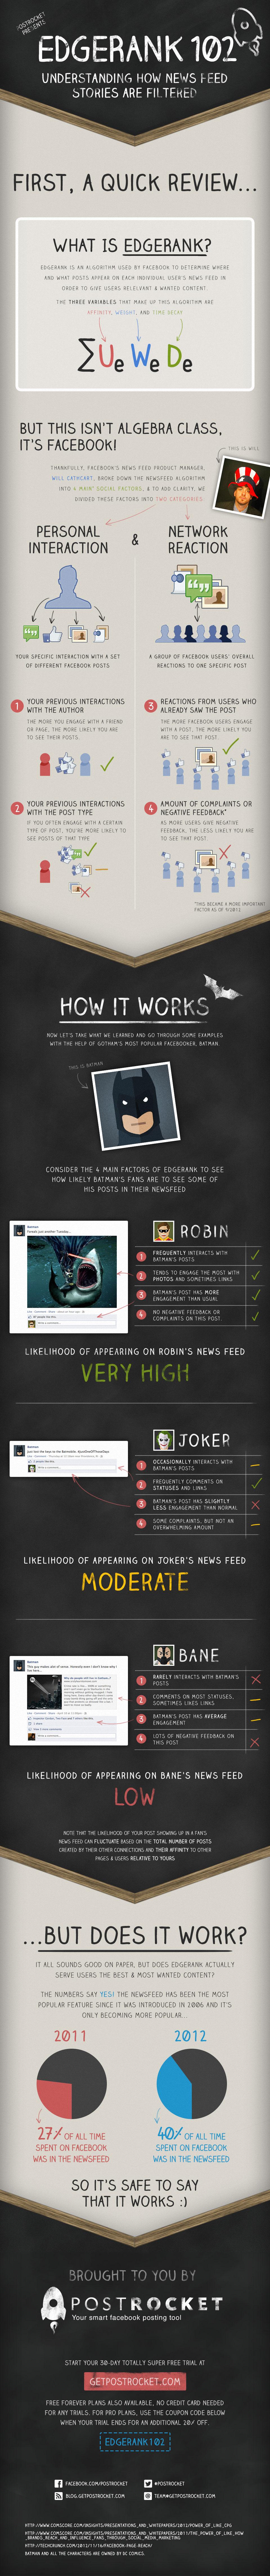 Facebook EdgeRank 102